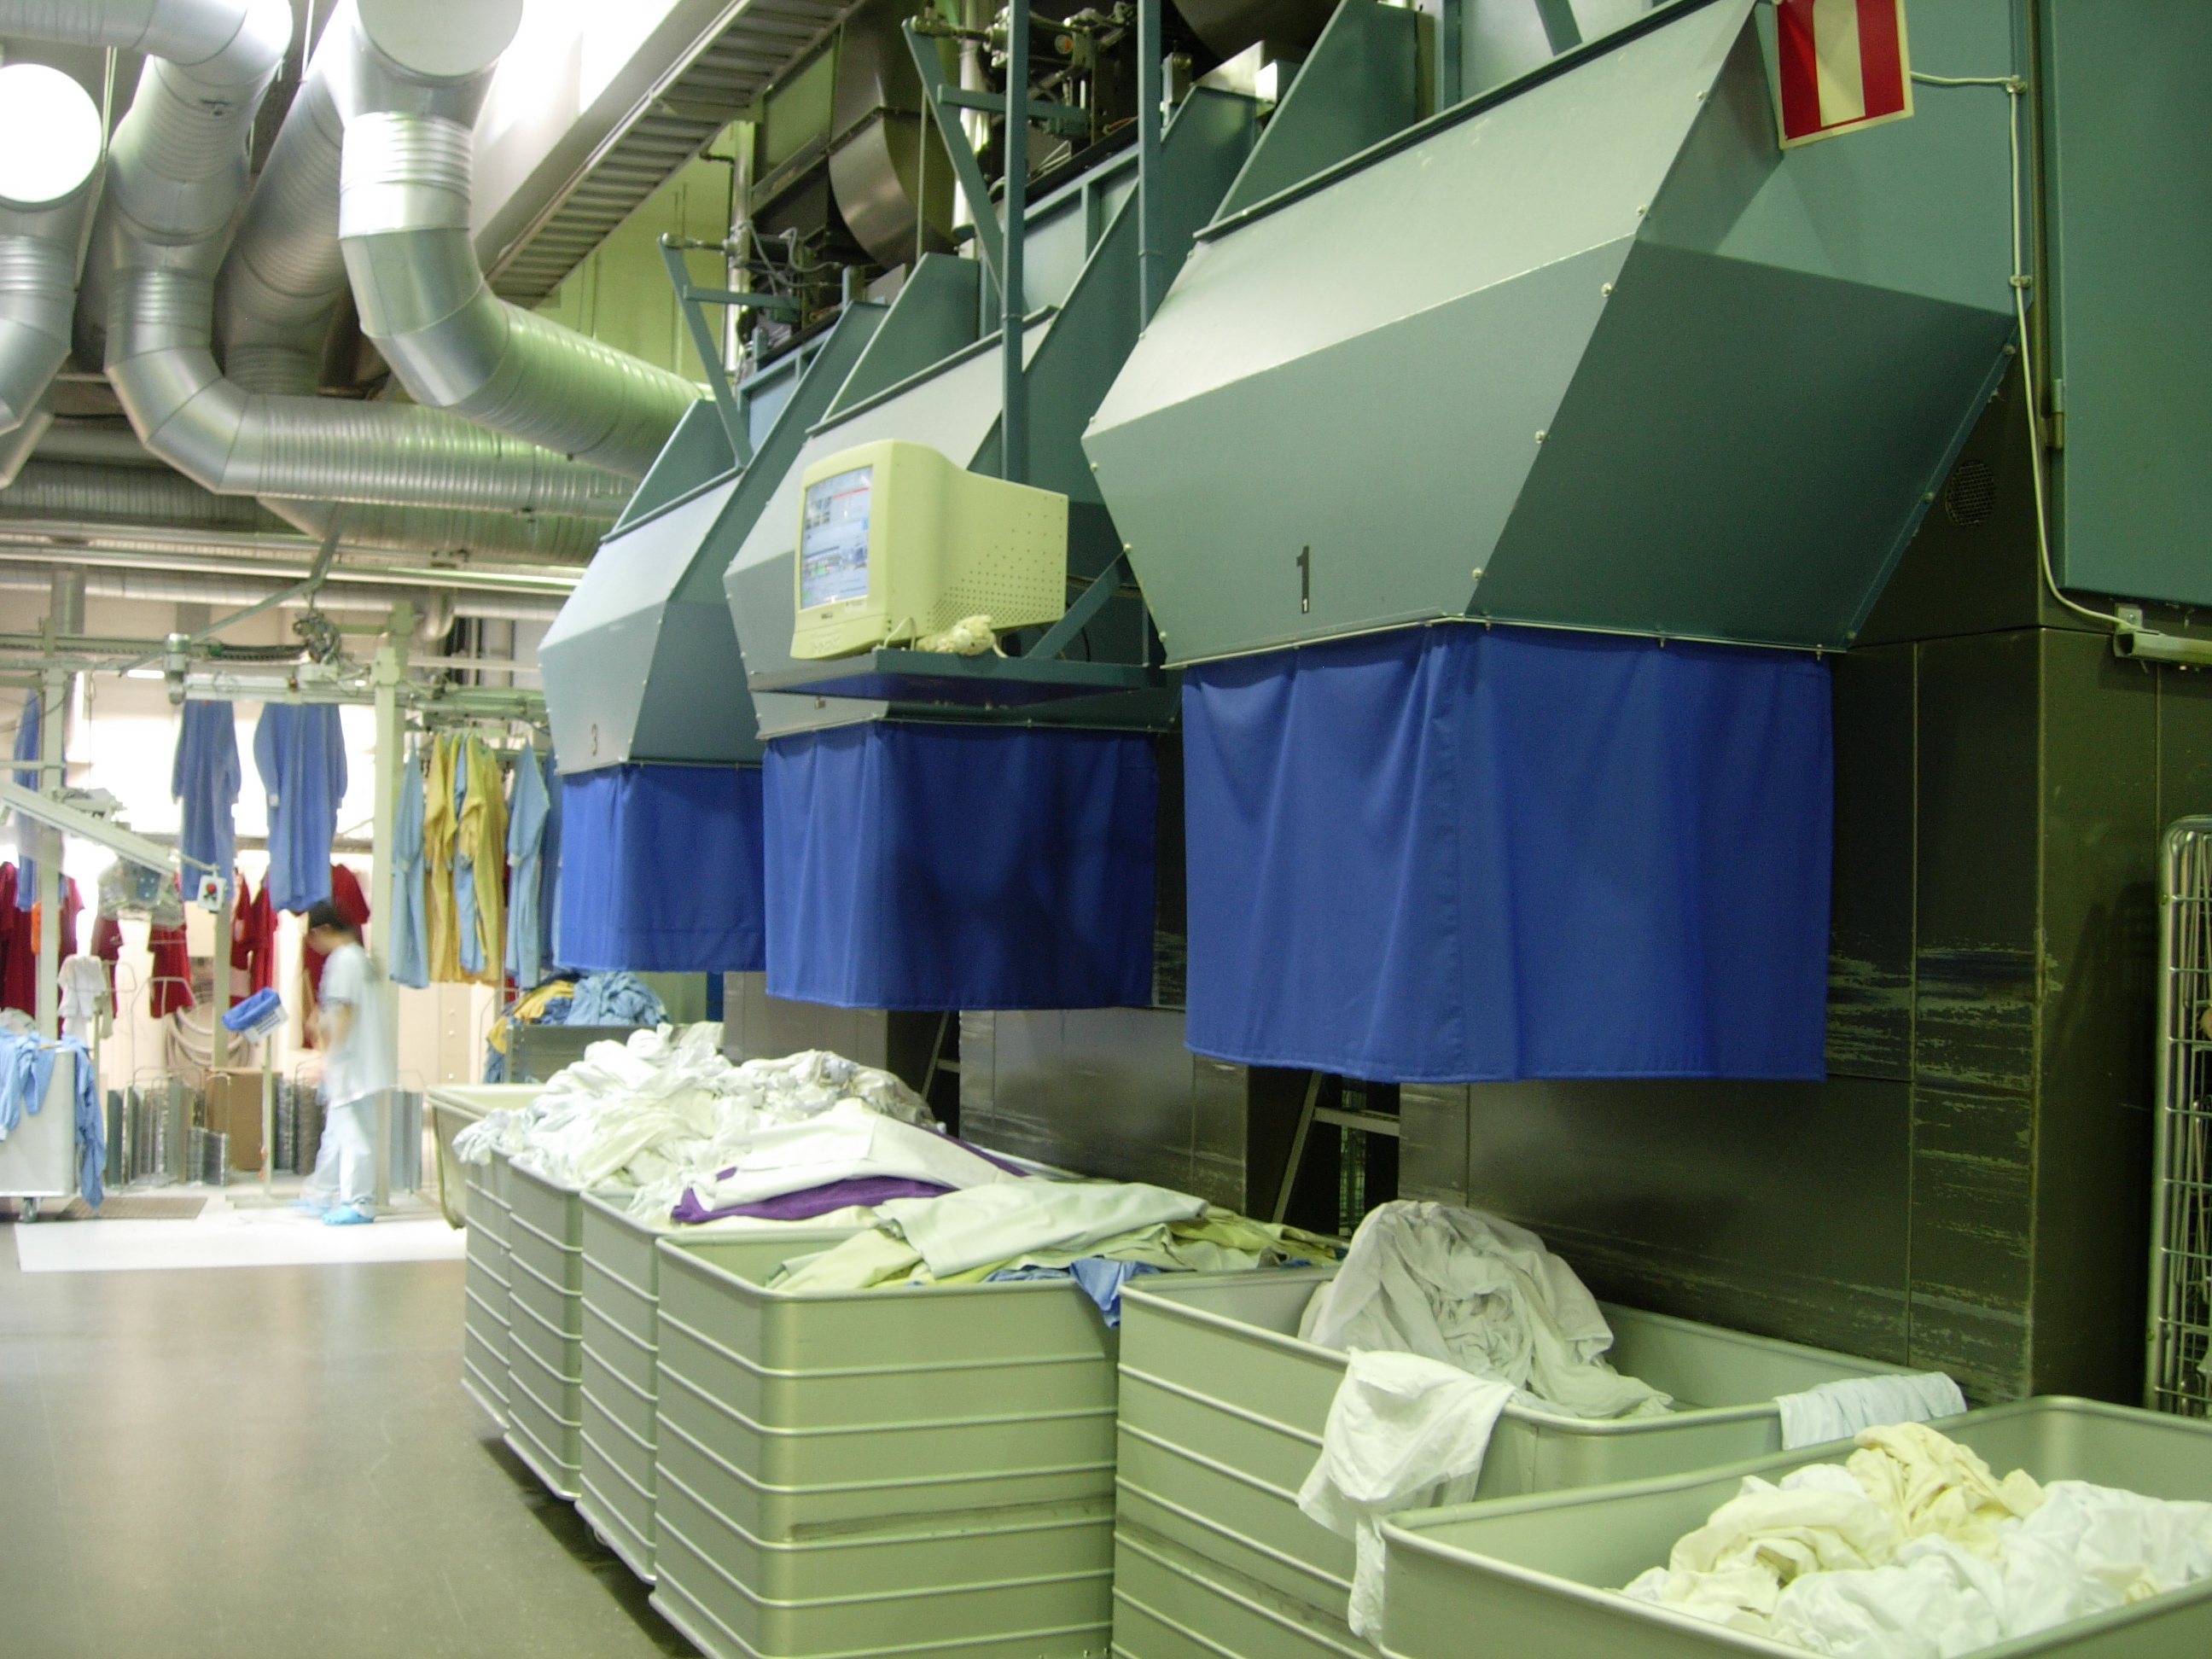 Laundry Room Hotels Edmonton Jobs Kijiji